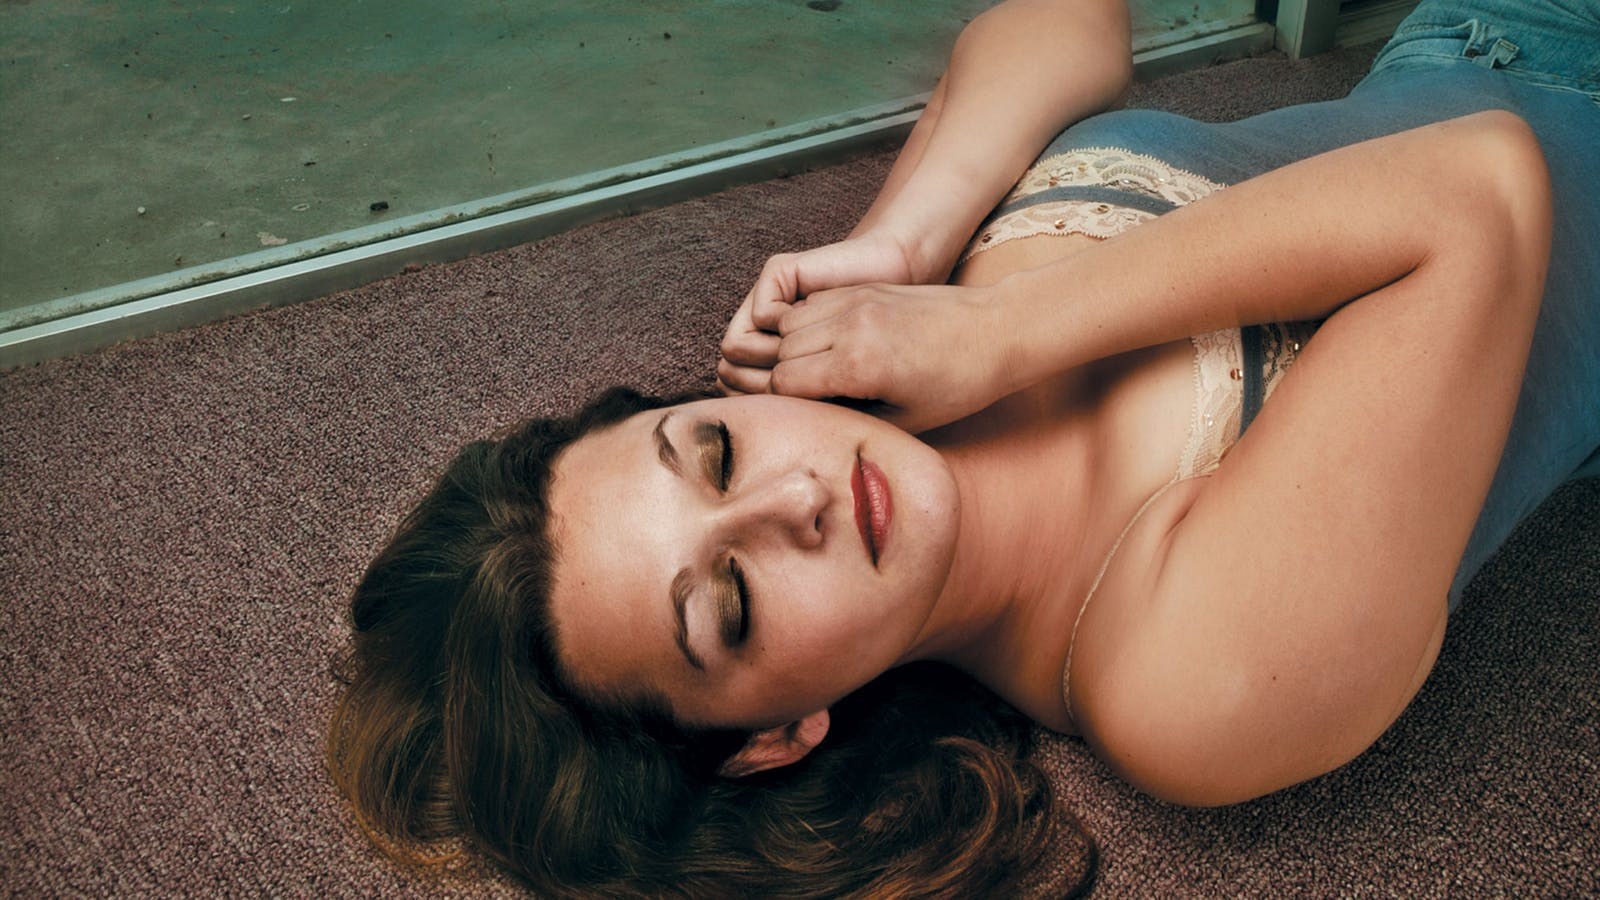 Mature Asian Lesbian Massage